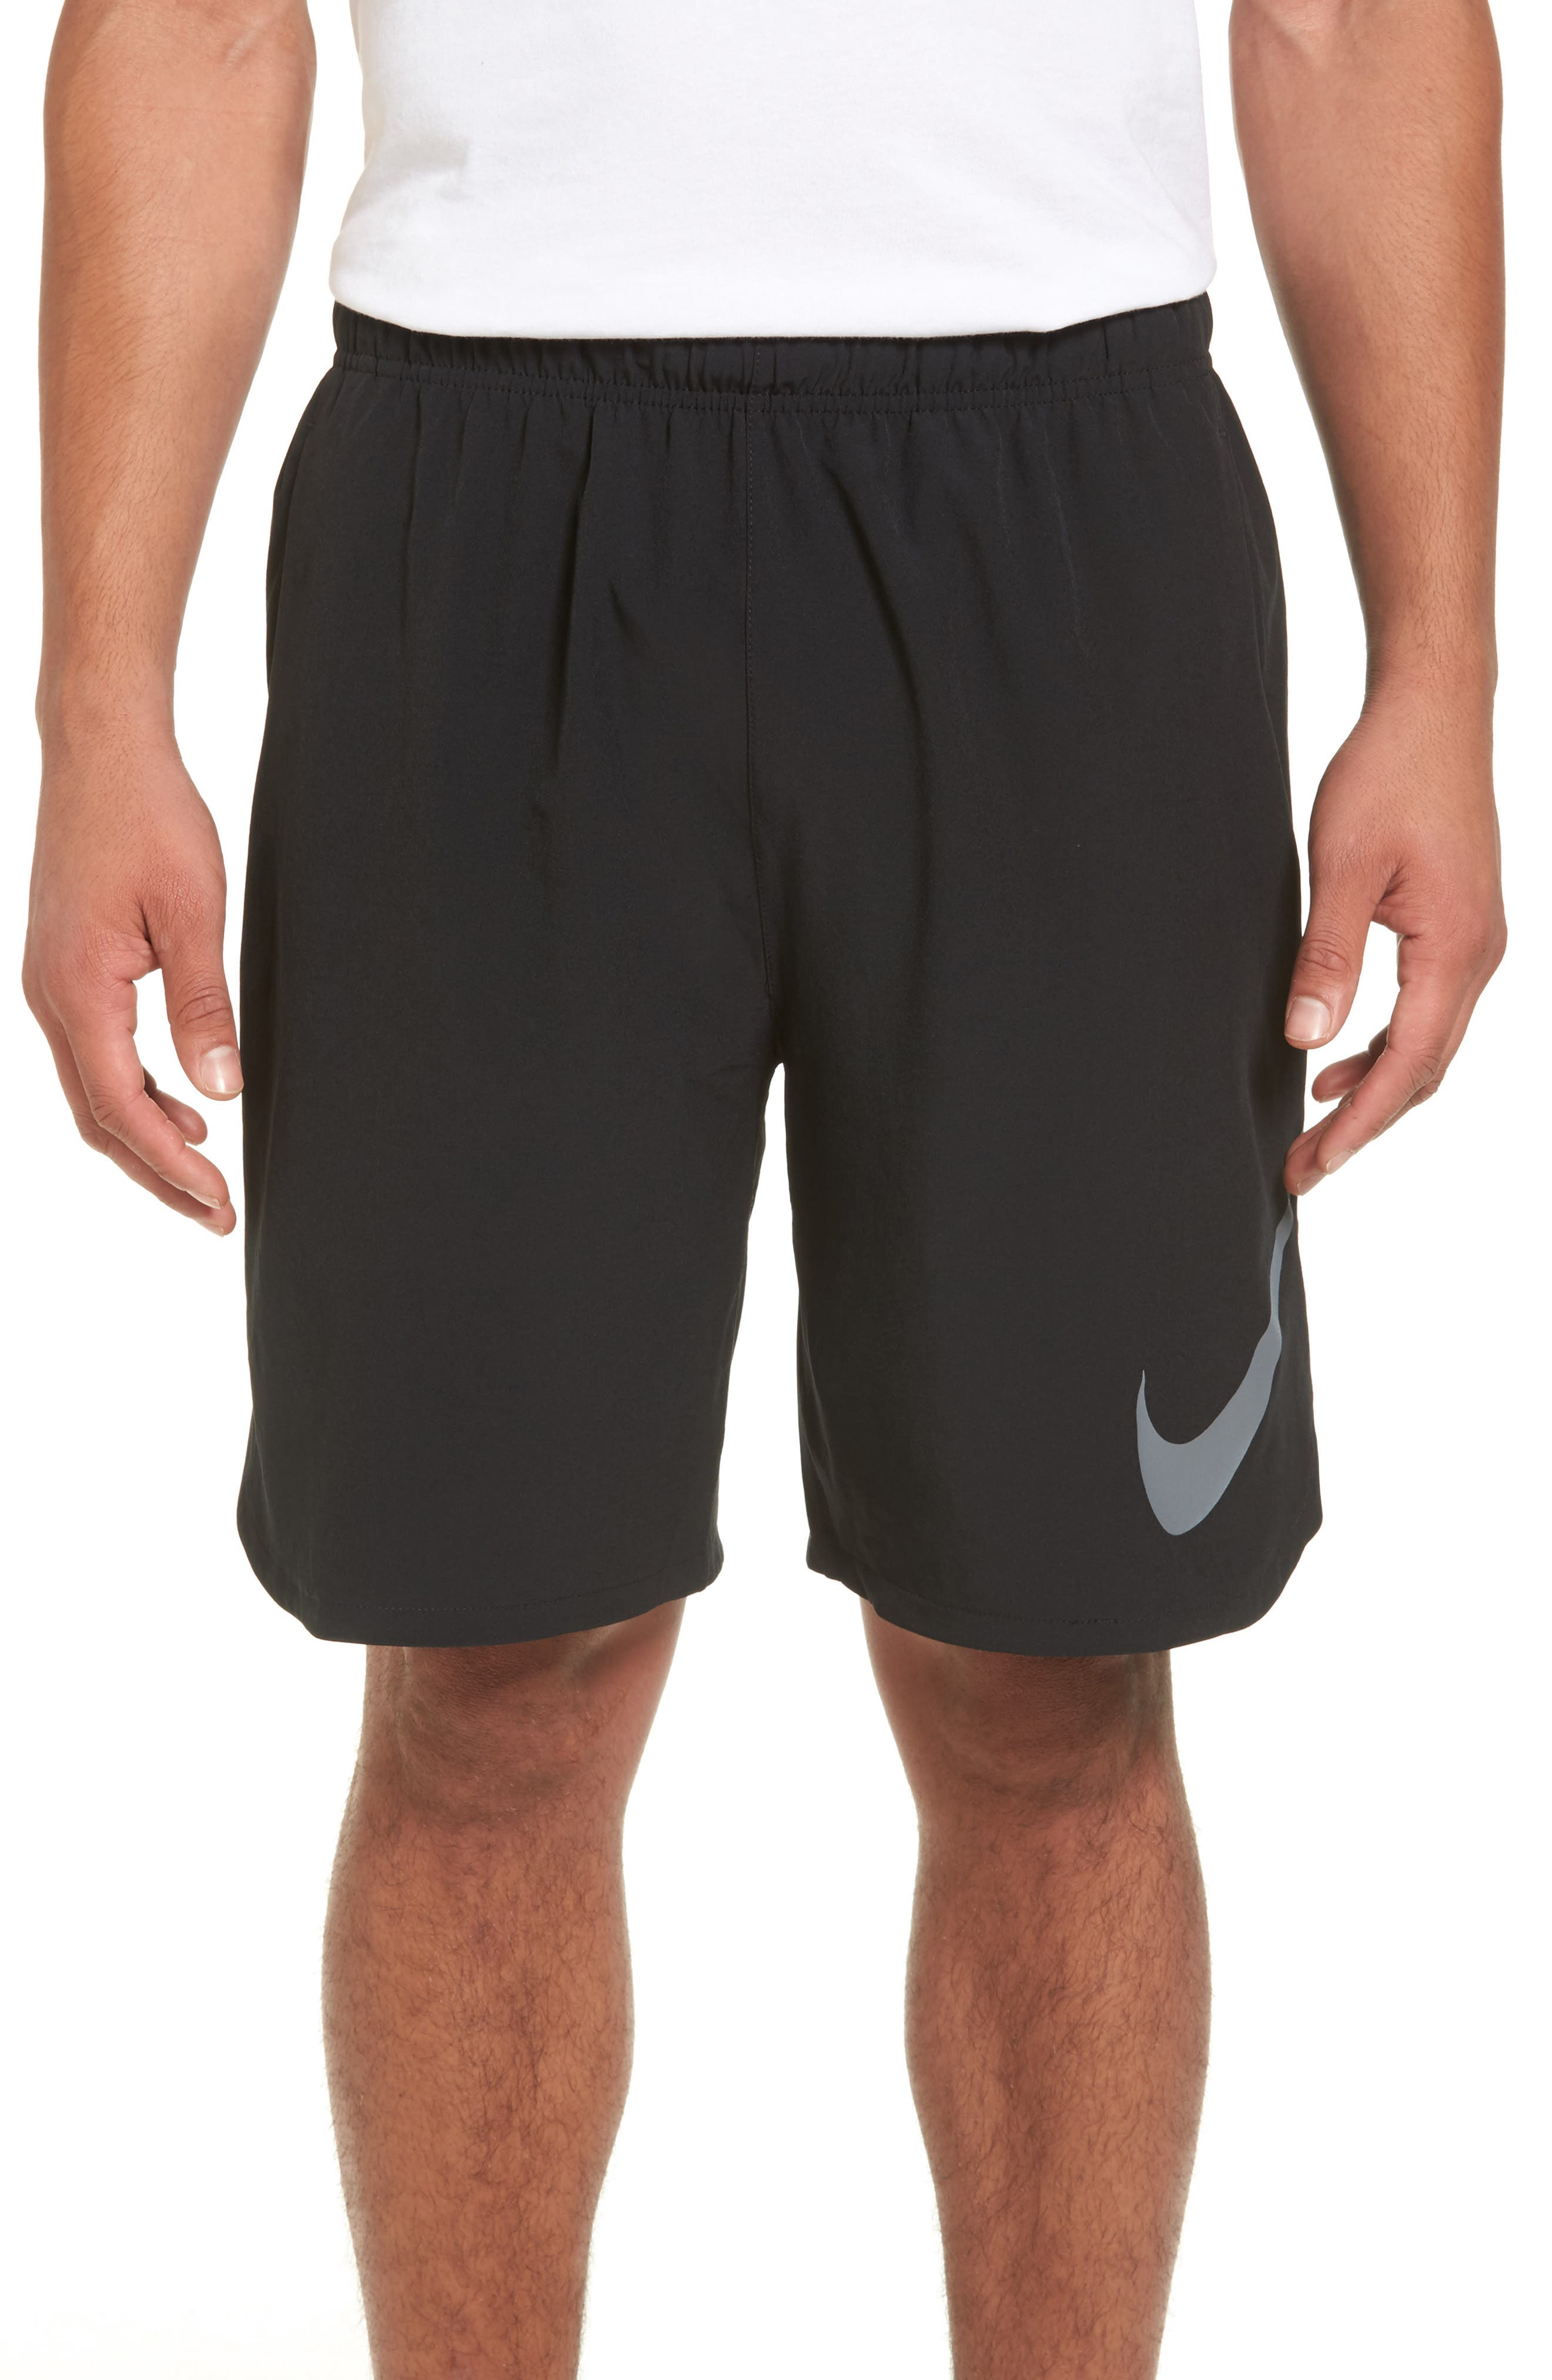 Flex Training Shorts,                             Main thumbnail 1, color,                             Black/ Cool Grey